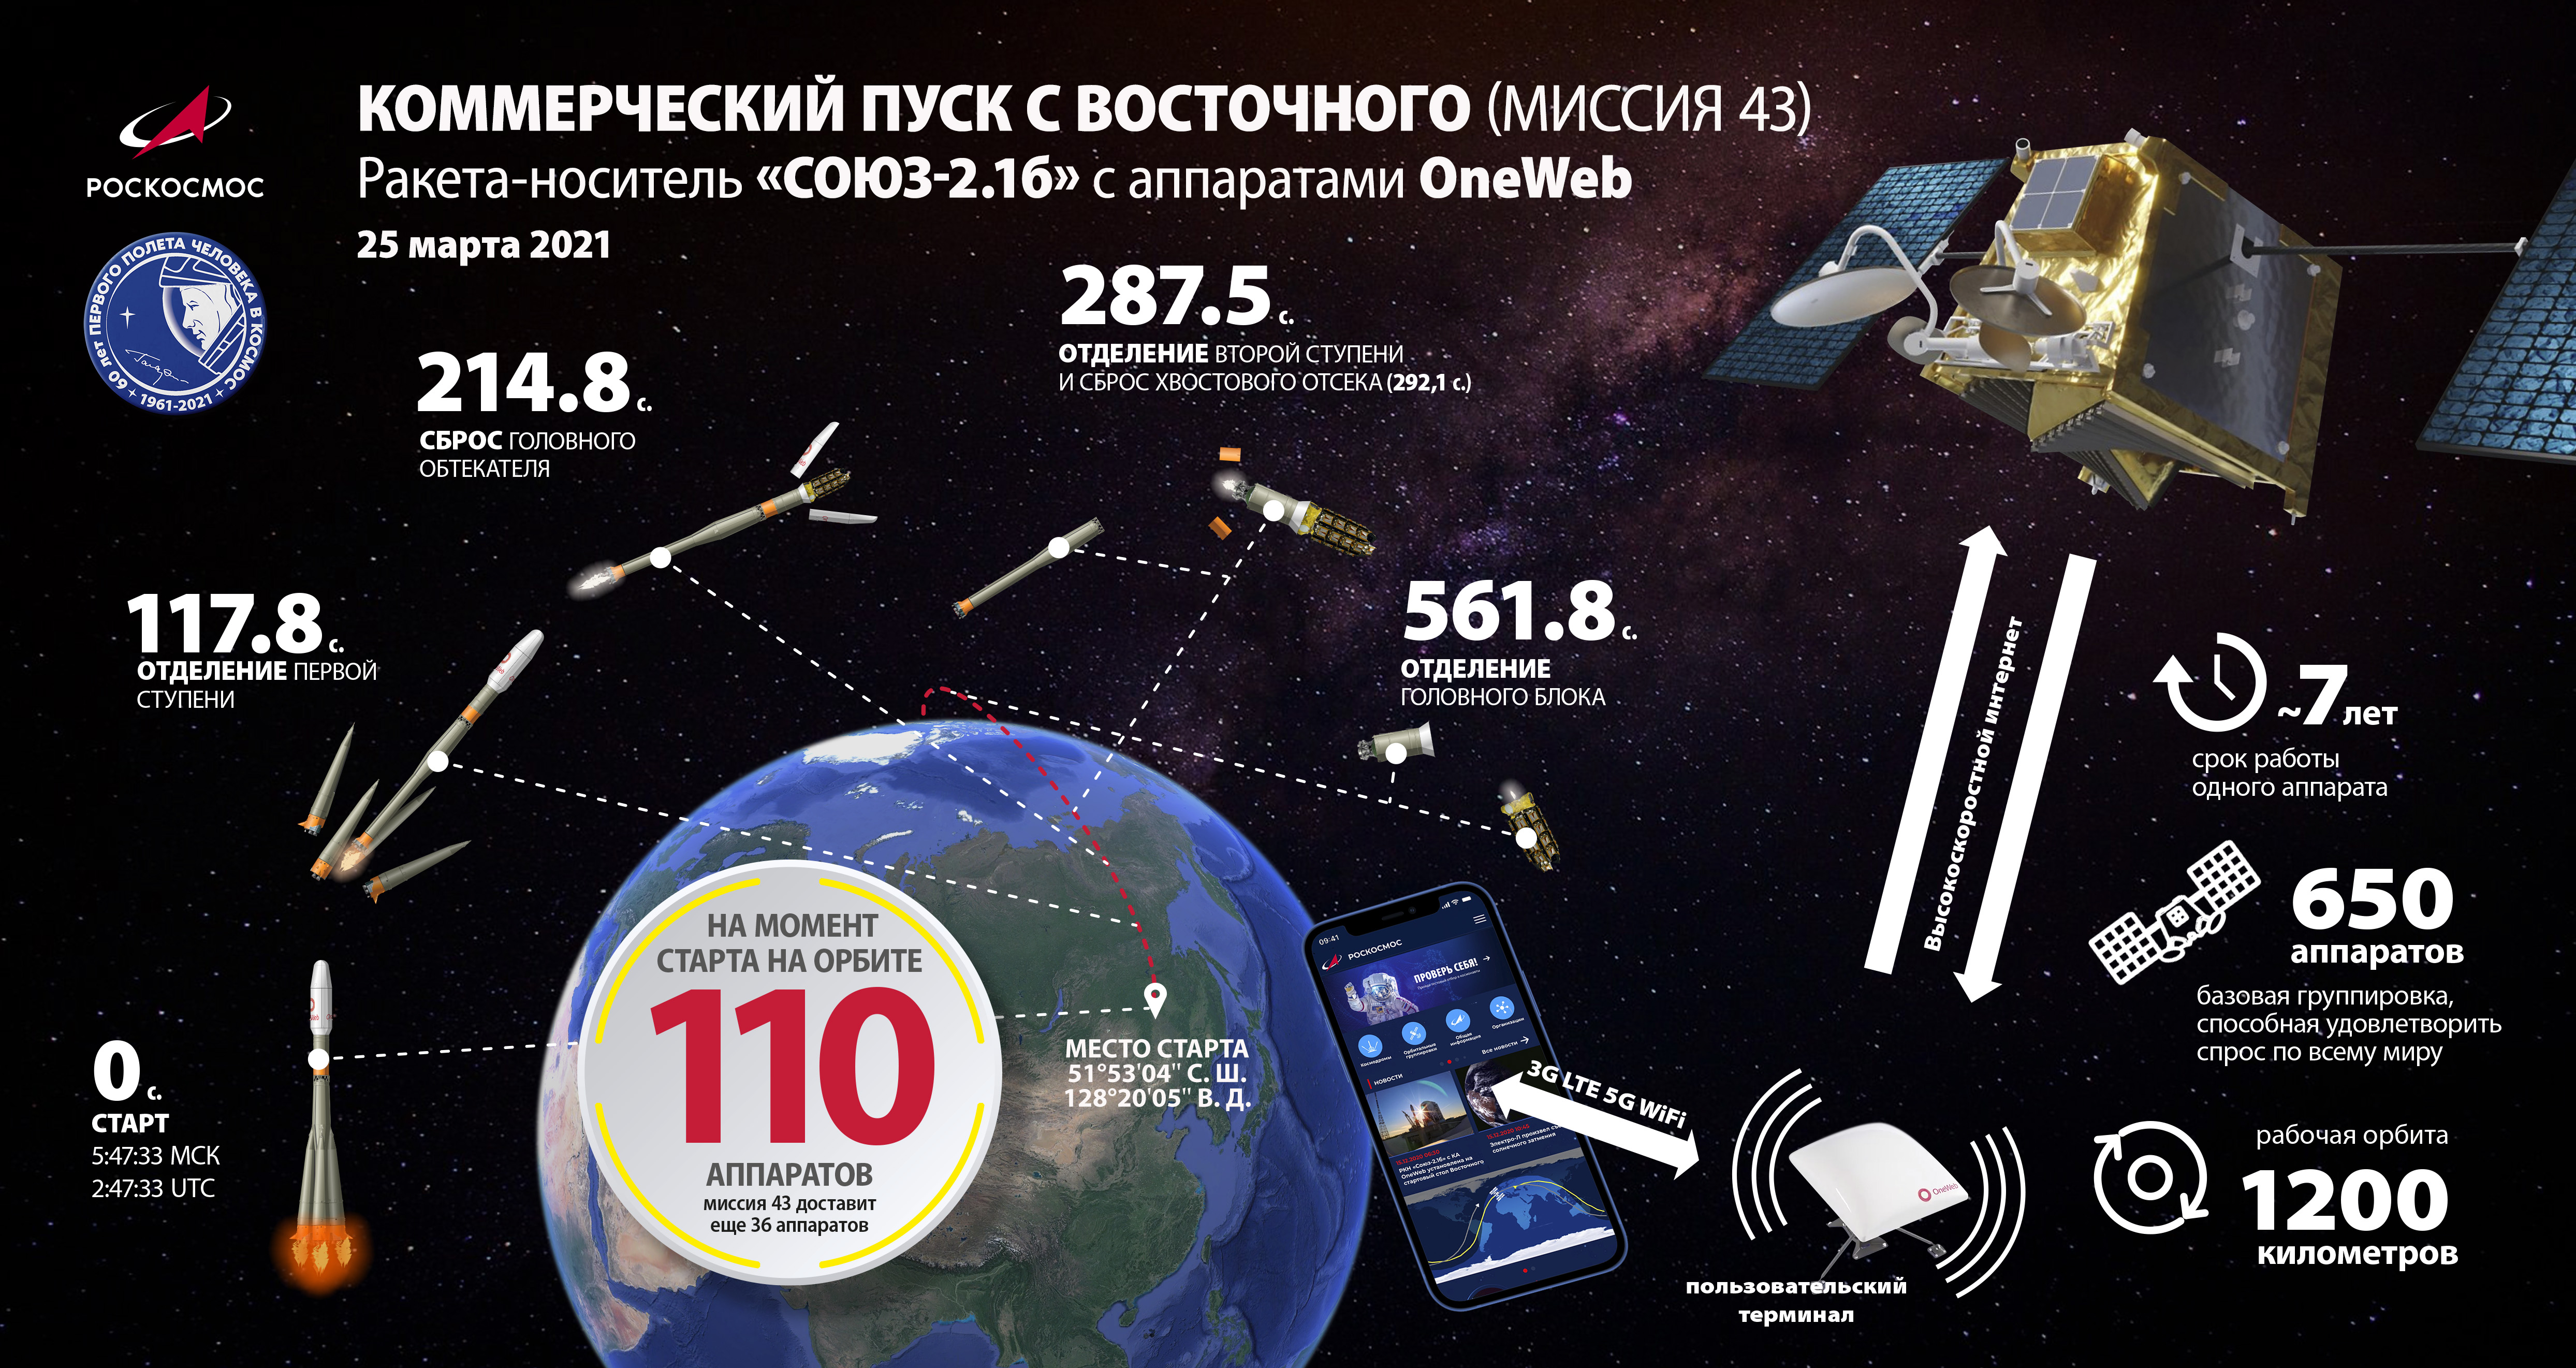 Soyouz-2.1b (36 OneWeb) - Vos - 25.3.2021 Ziklogramma.oneweb.m43